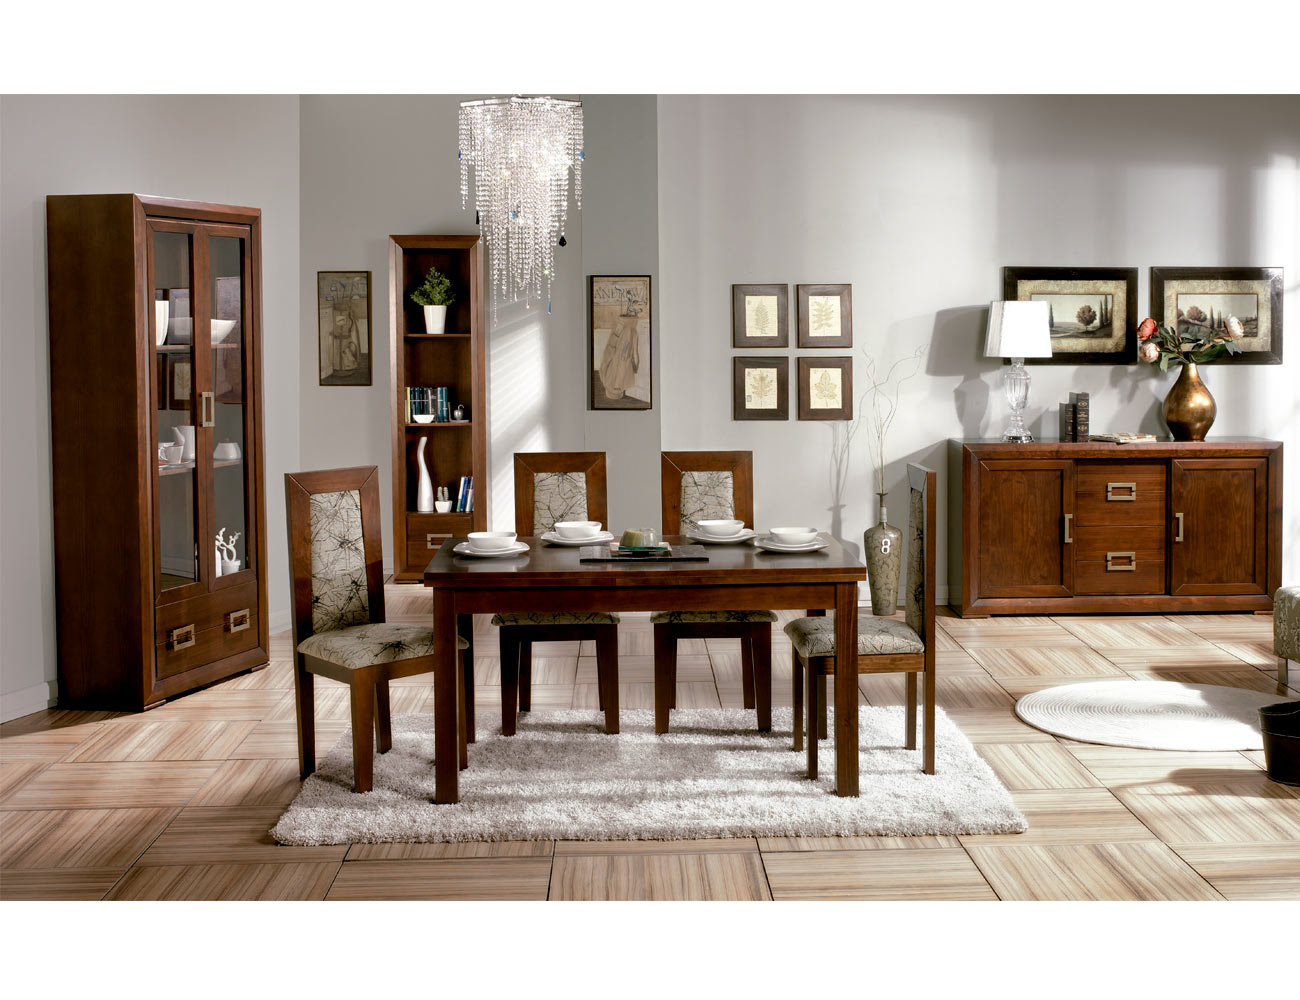 Composicion34 mueble salon comedor madera3